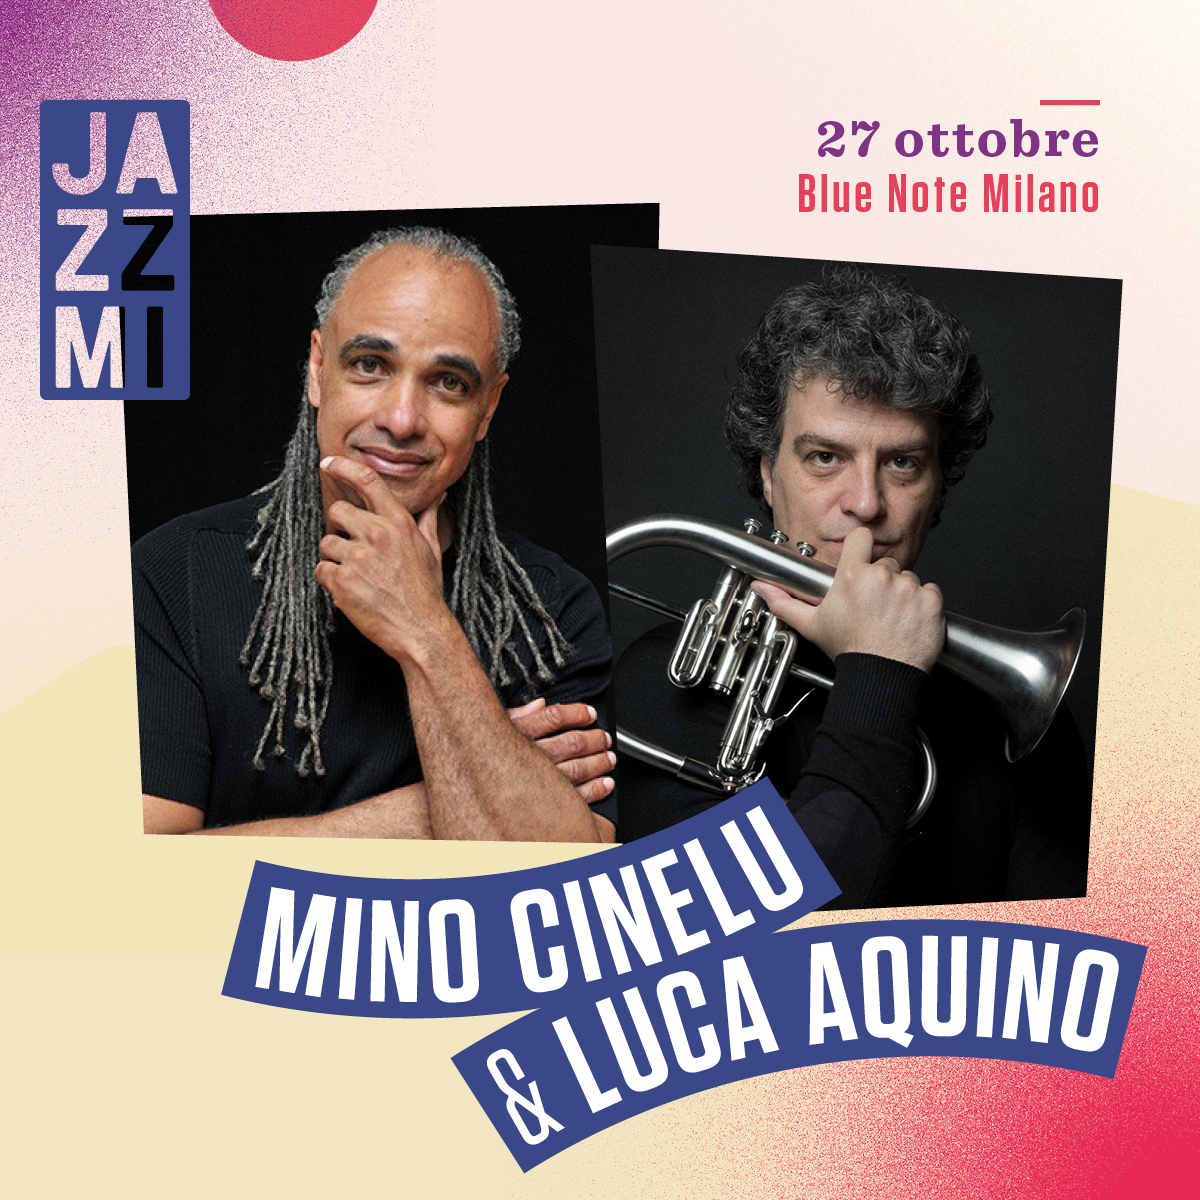 JAZZMI Mino Cinelu & Luca Aquino – ANNULLATO 27/10/2020 20.30